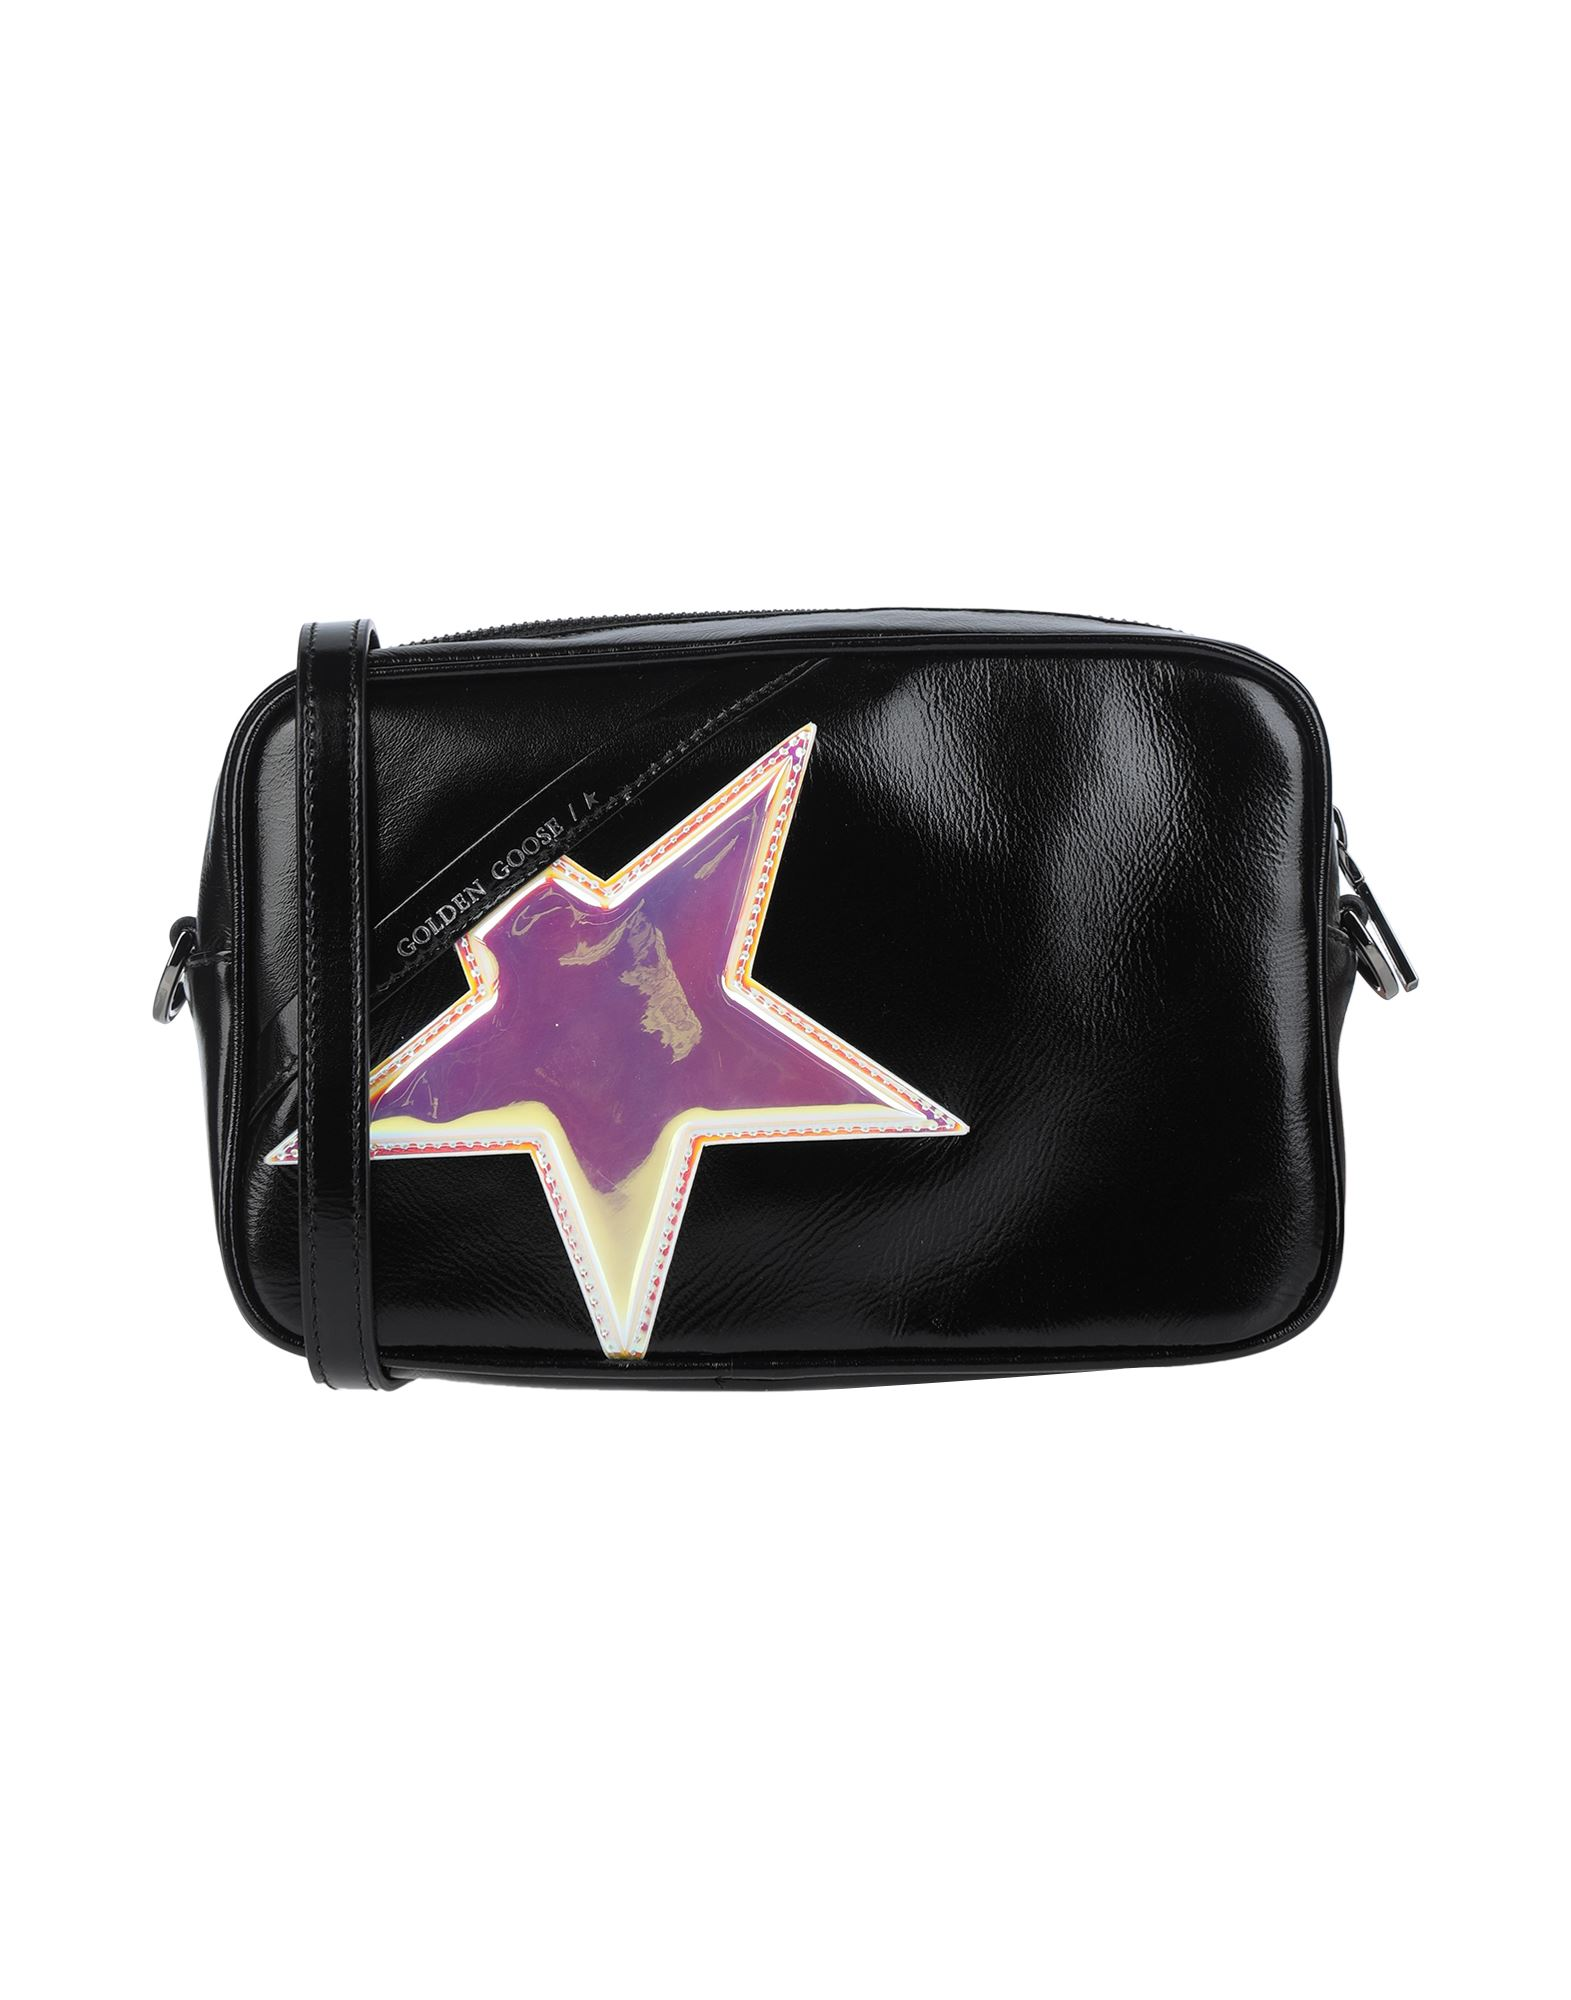 GOLDEN GOOSE DELUXE BRAND Сумка через плечо сумка через плечо new brand 2015 desigual 8181